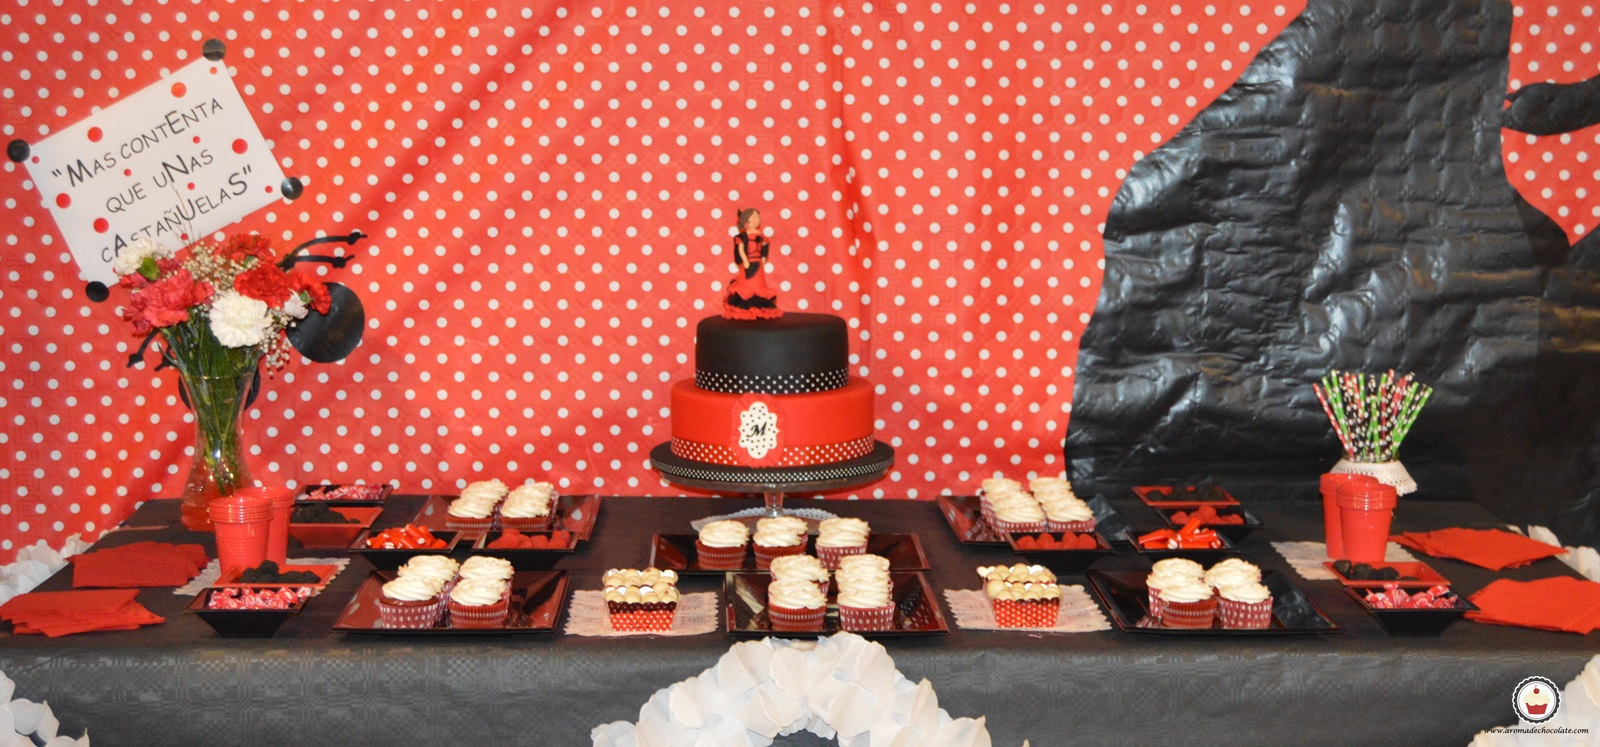 Mesa dulce sevillana. Aroma de chocolate